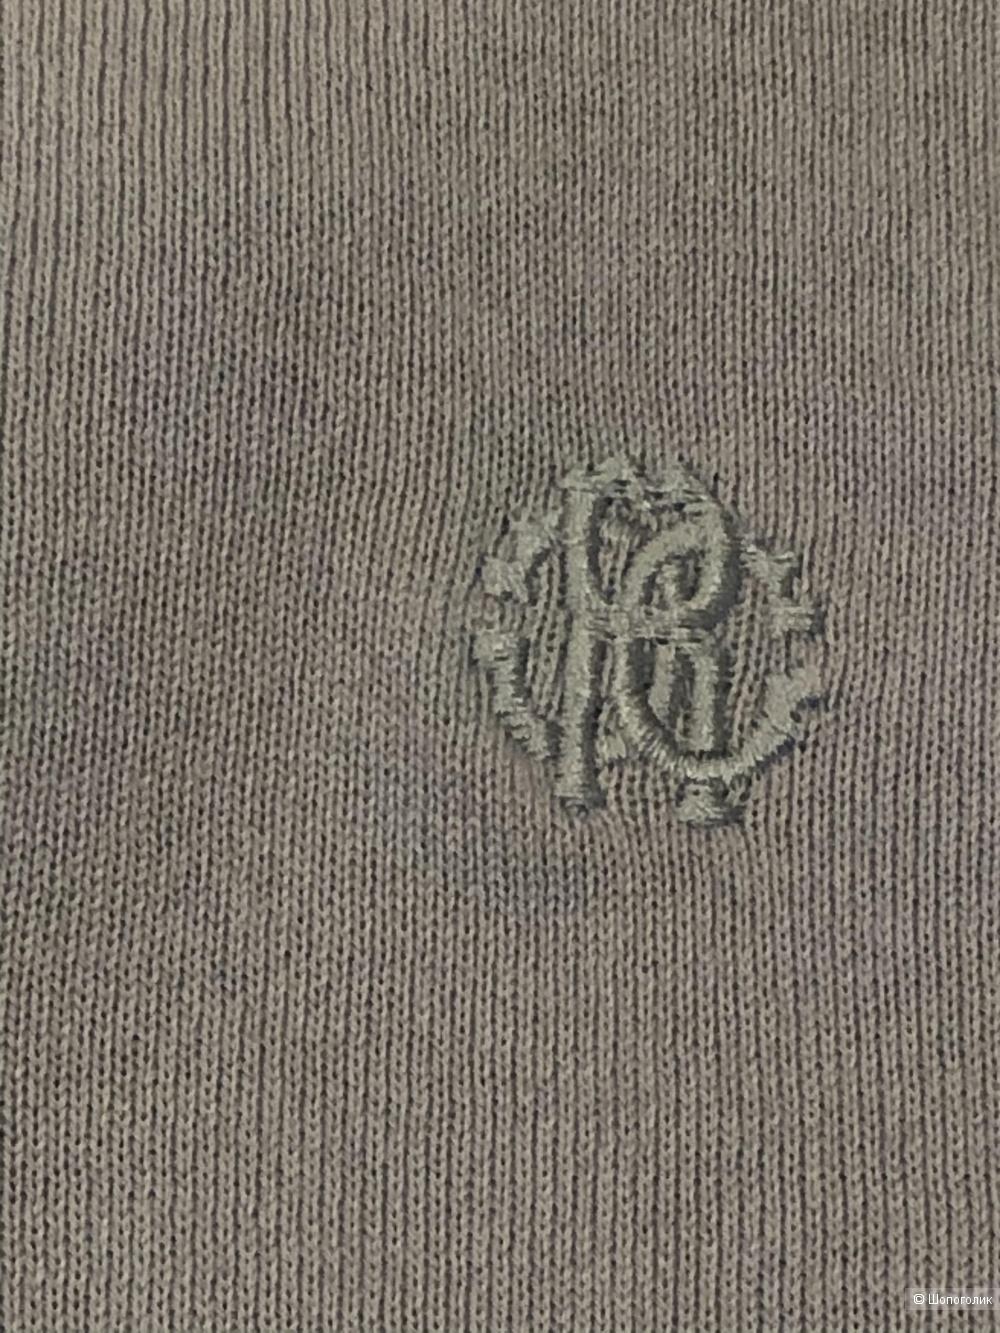 Мужское поло-свитер ROBERTO CAVALLI р. М